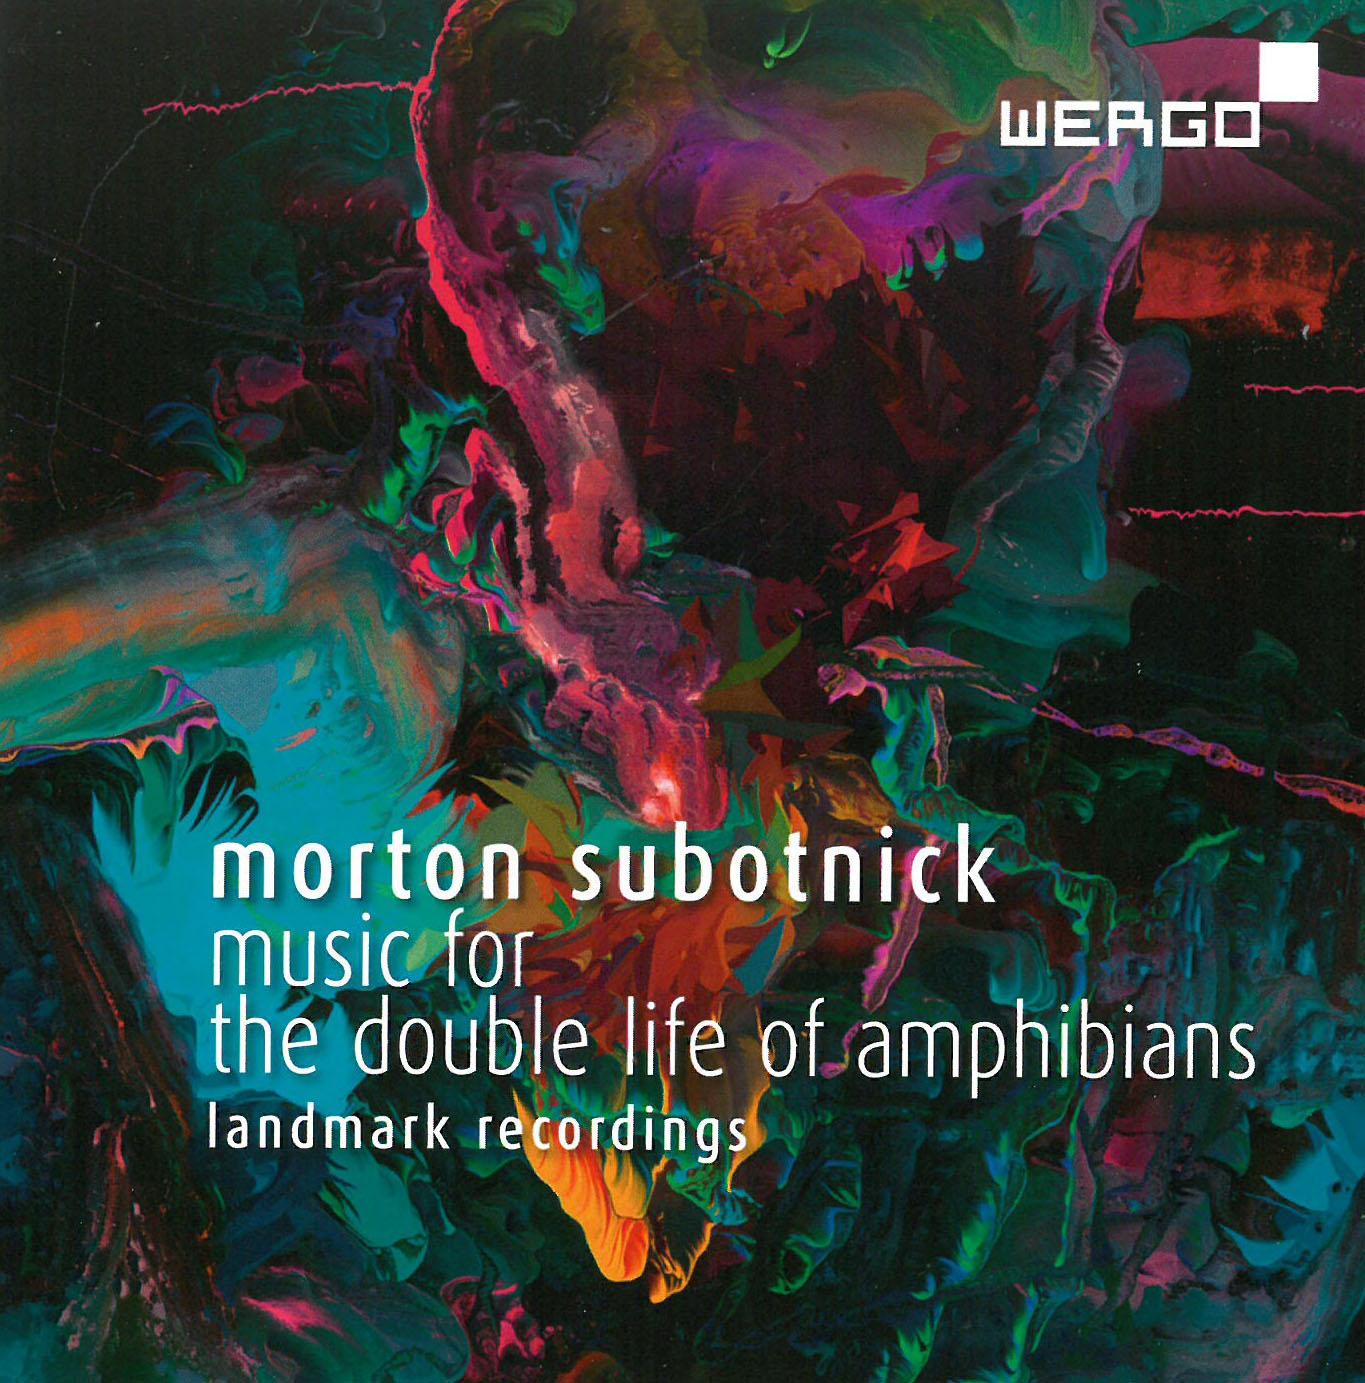 Morton Subotnick - Electronic Works Vol. 2